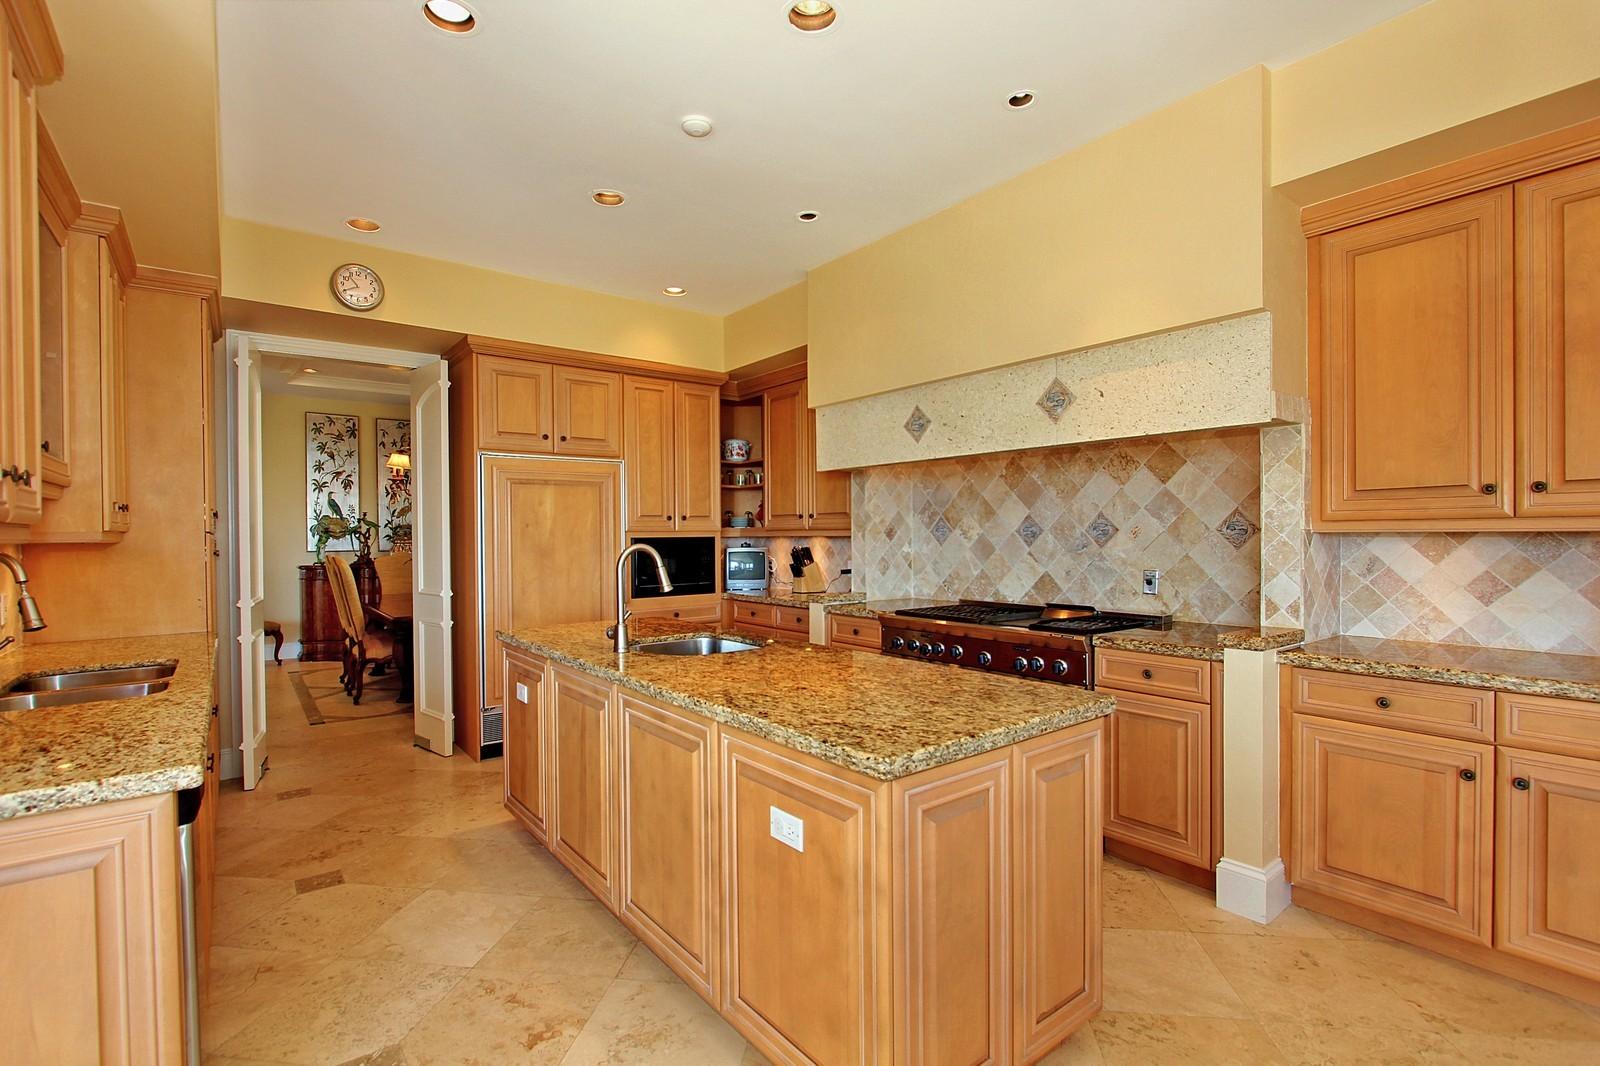 Real Estate Photography - 3047 SE Island Point Lane, Stuart, FL, 34996 - Kitchen